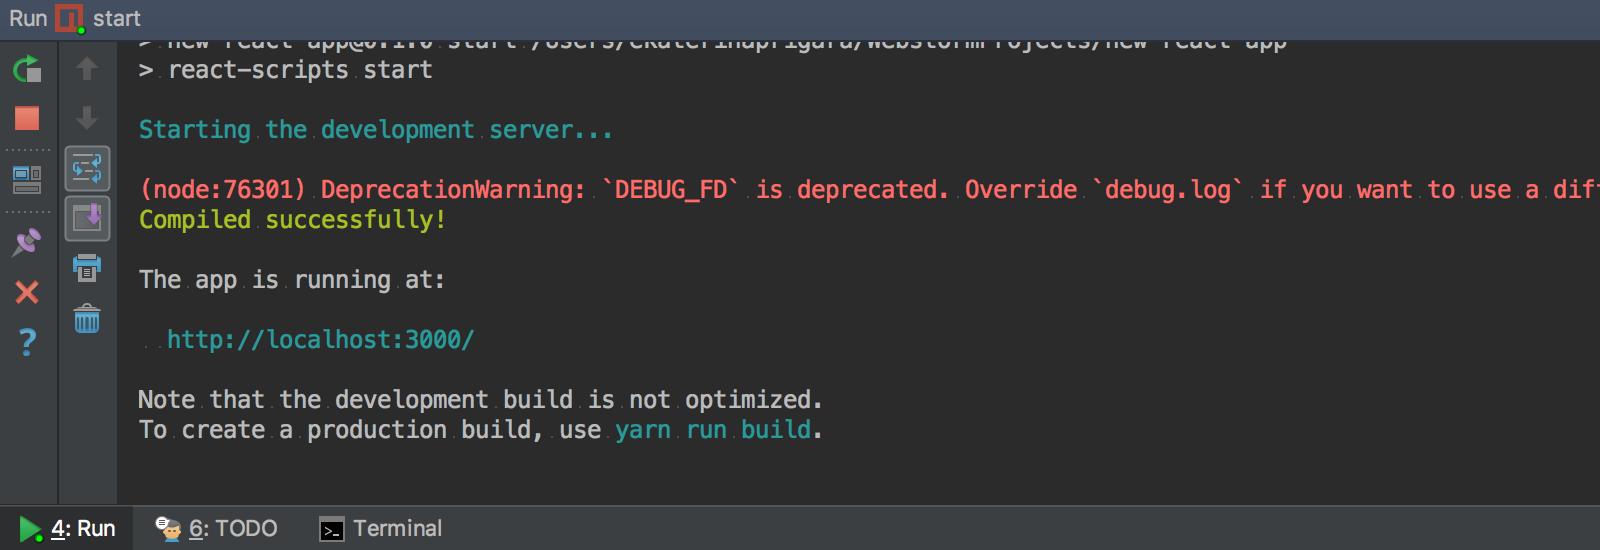 ws_react_debug_cra_app_is_running.png